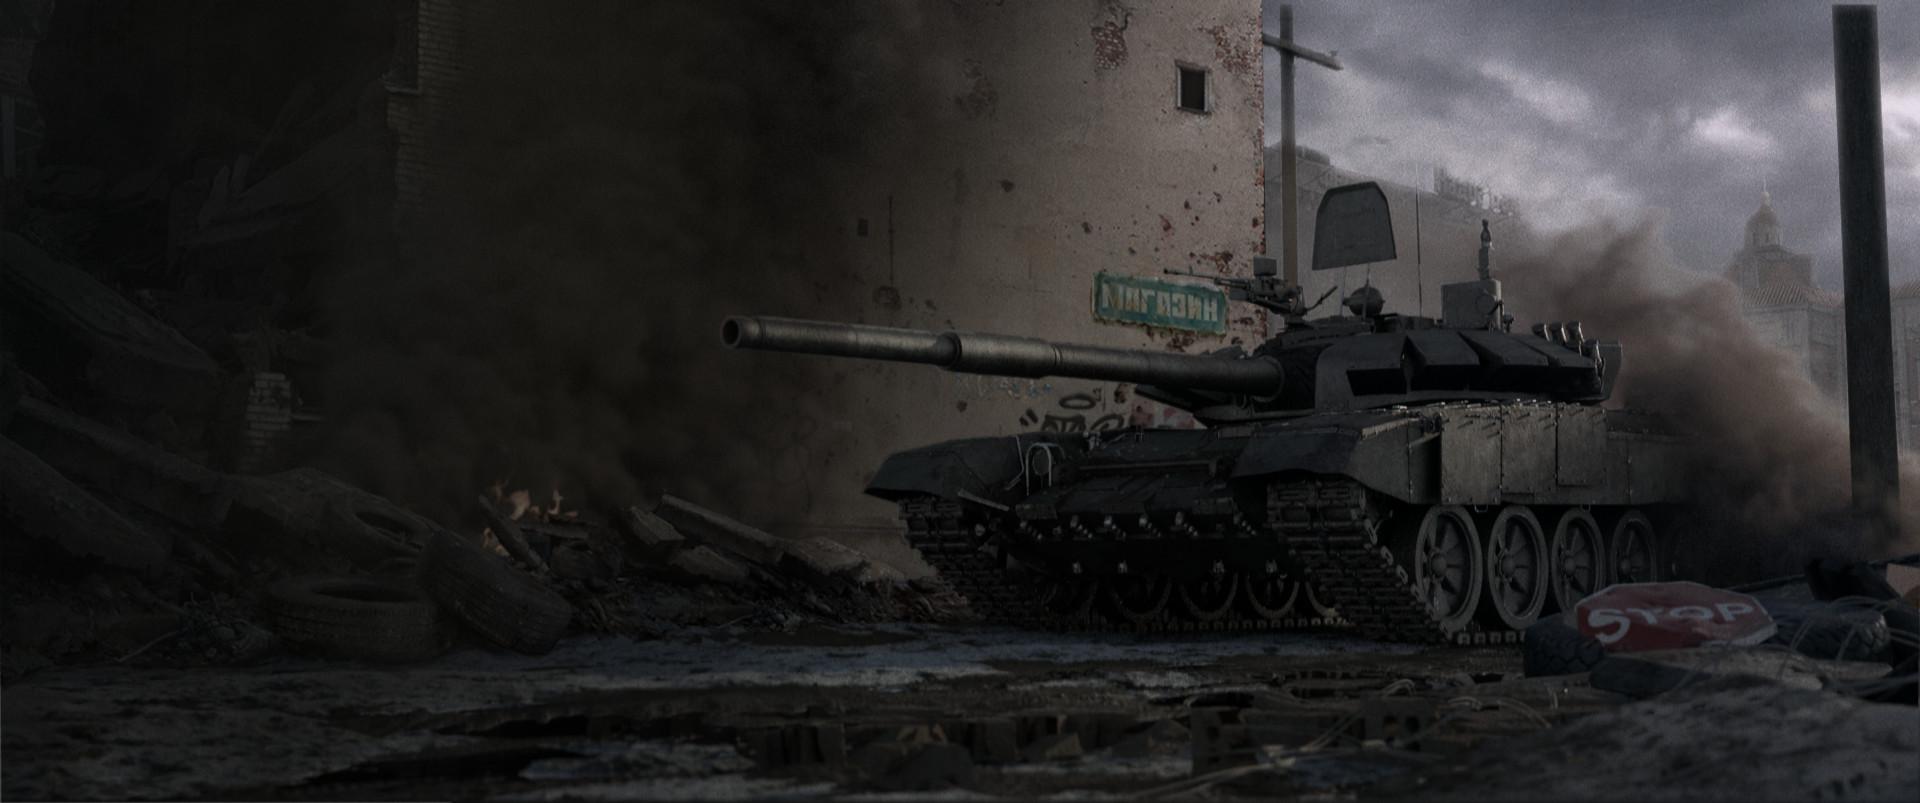 Vladimir mrkvica tank